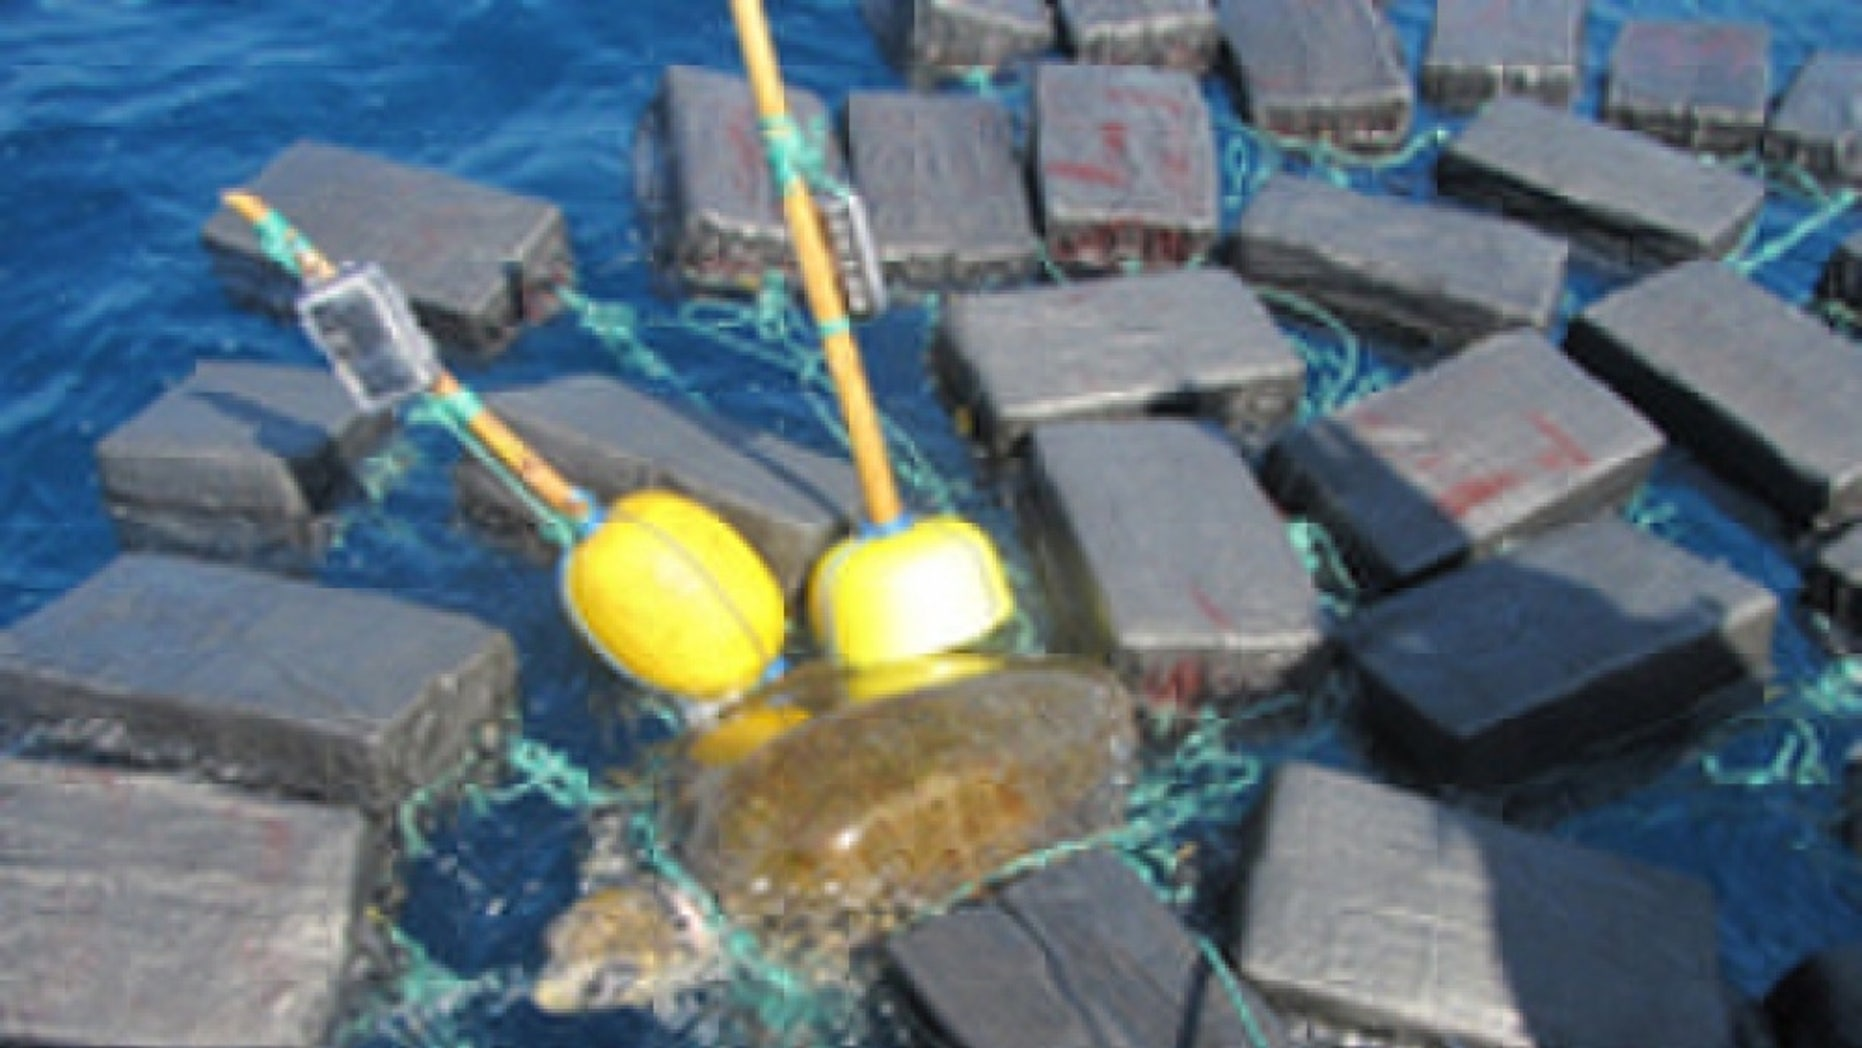 The sea turtle was found entangled in bales of cocaine worth $53 million, the U.S. Coast Guard said.